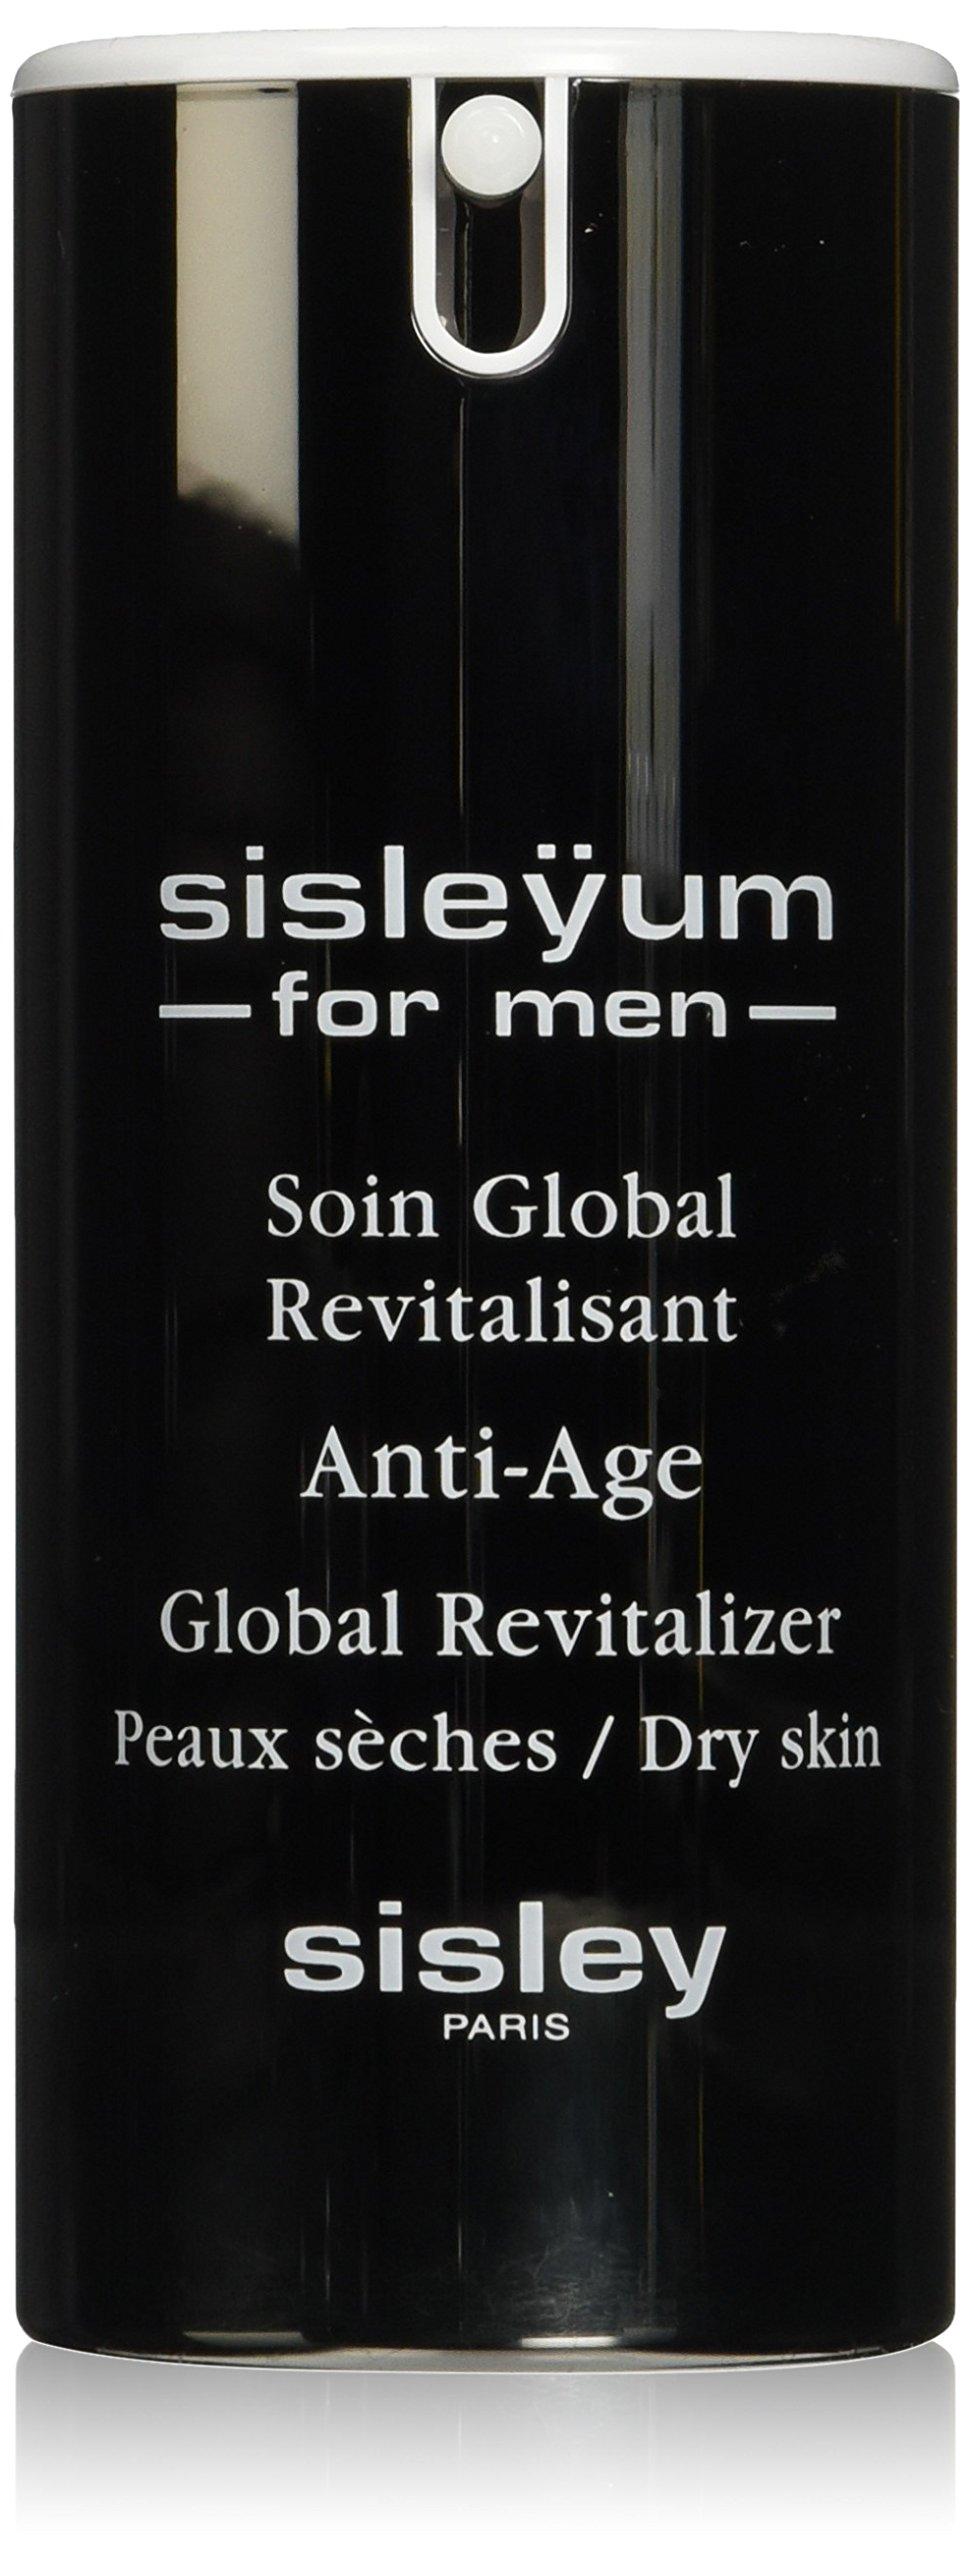 Sisley Sisleyum Anti-Age Global Revitalizer for Unisex Dry Skin, 1.7 Ounce